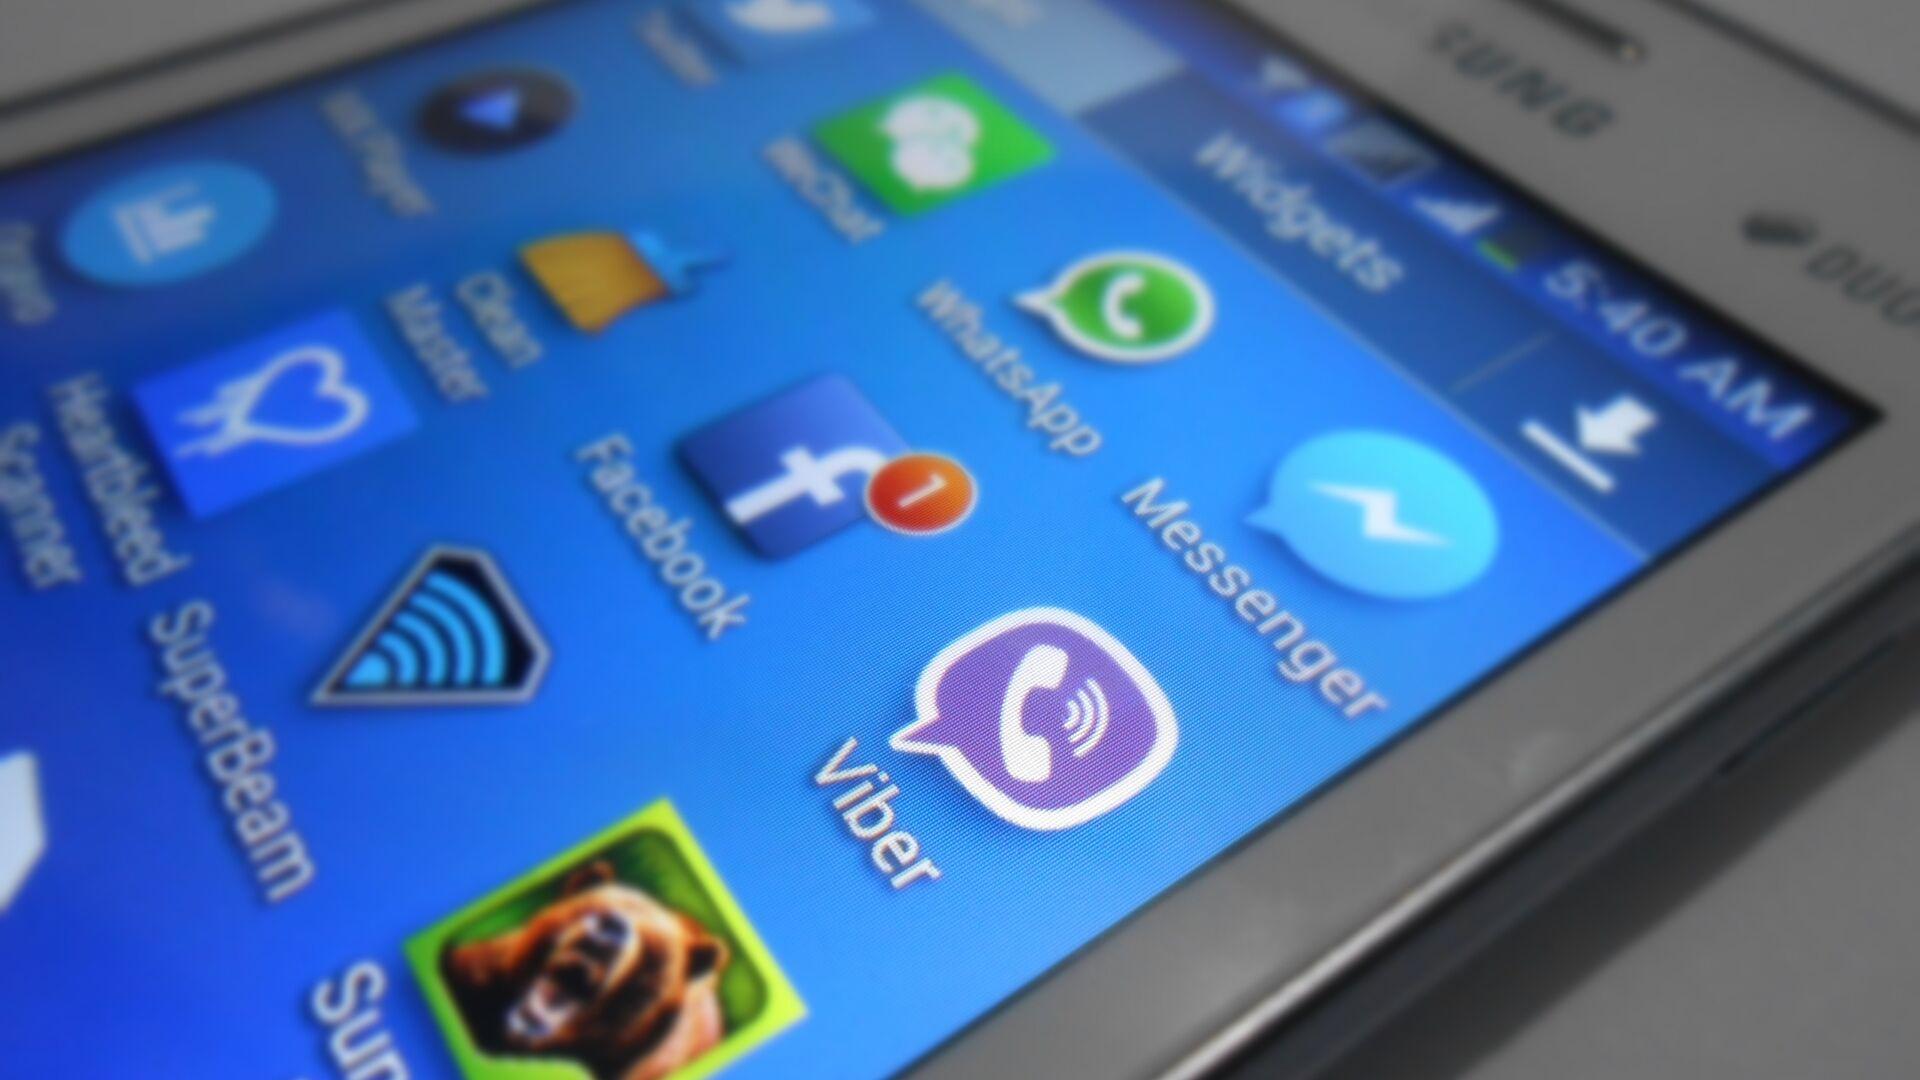 Viber, WhatsApp and other applications. - Sputnik Italia, 1920, 30.05.2021